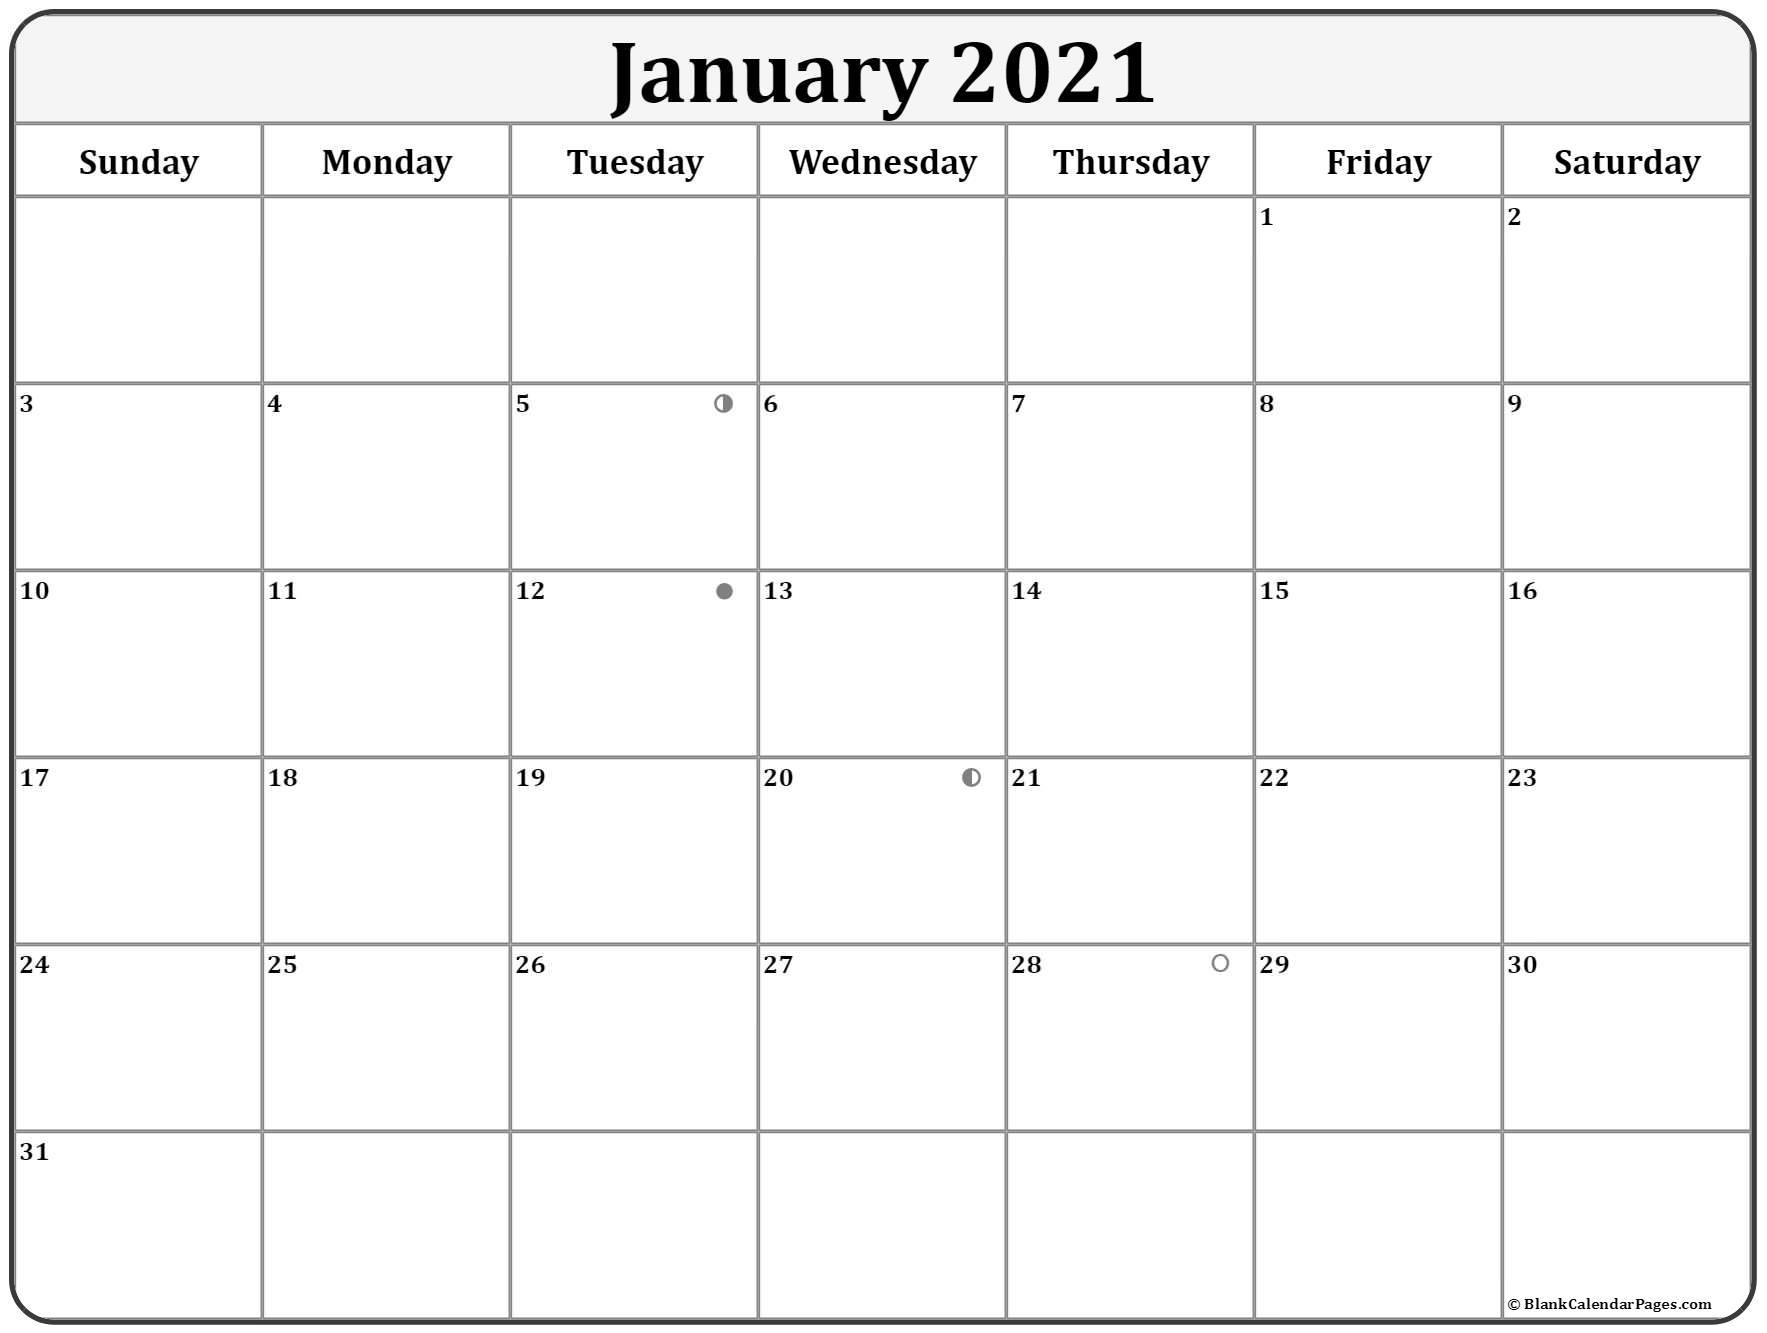 January 2021 Lunar Calendar   Moon Phase Calendar With Moon Calendar 2021 Name And Date For Kids